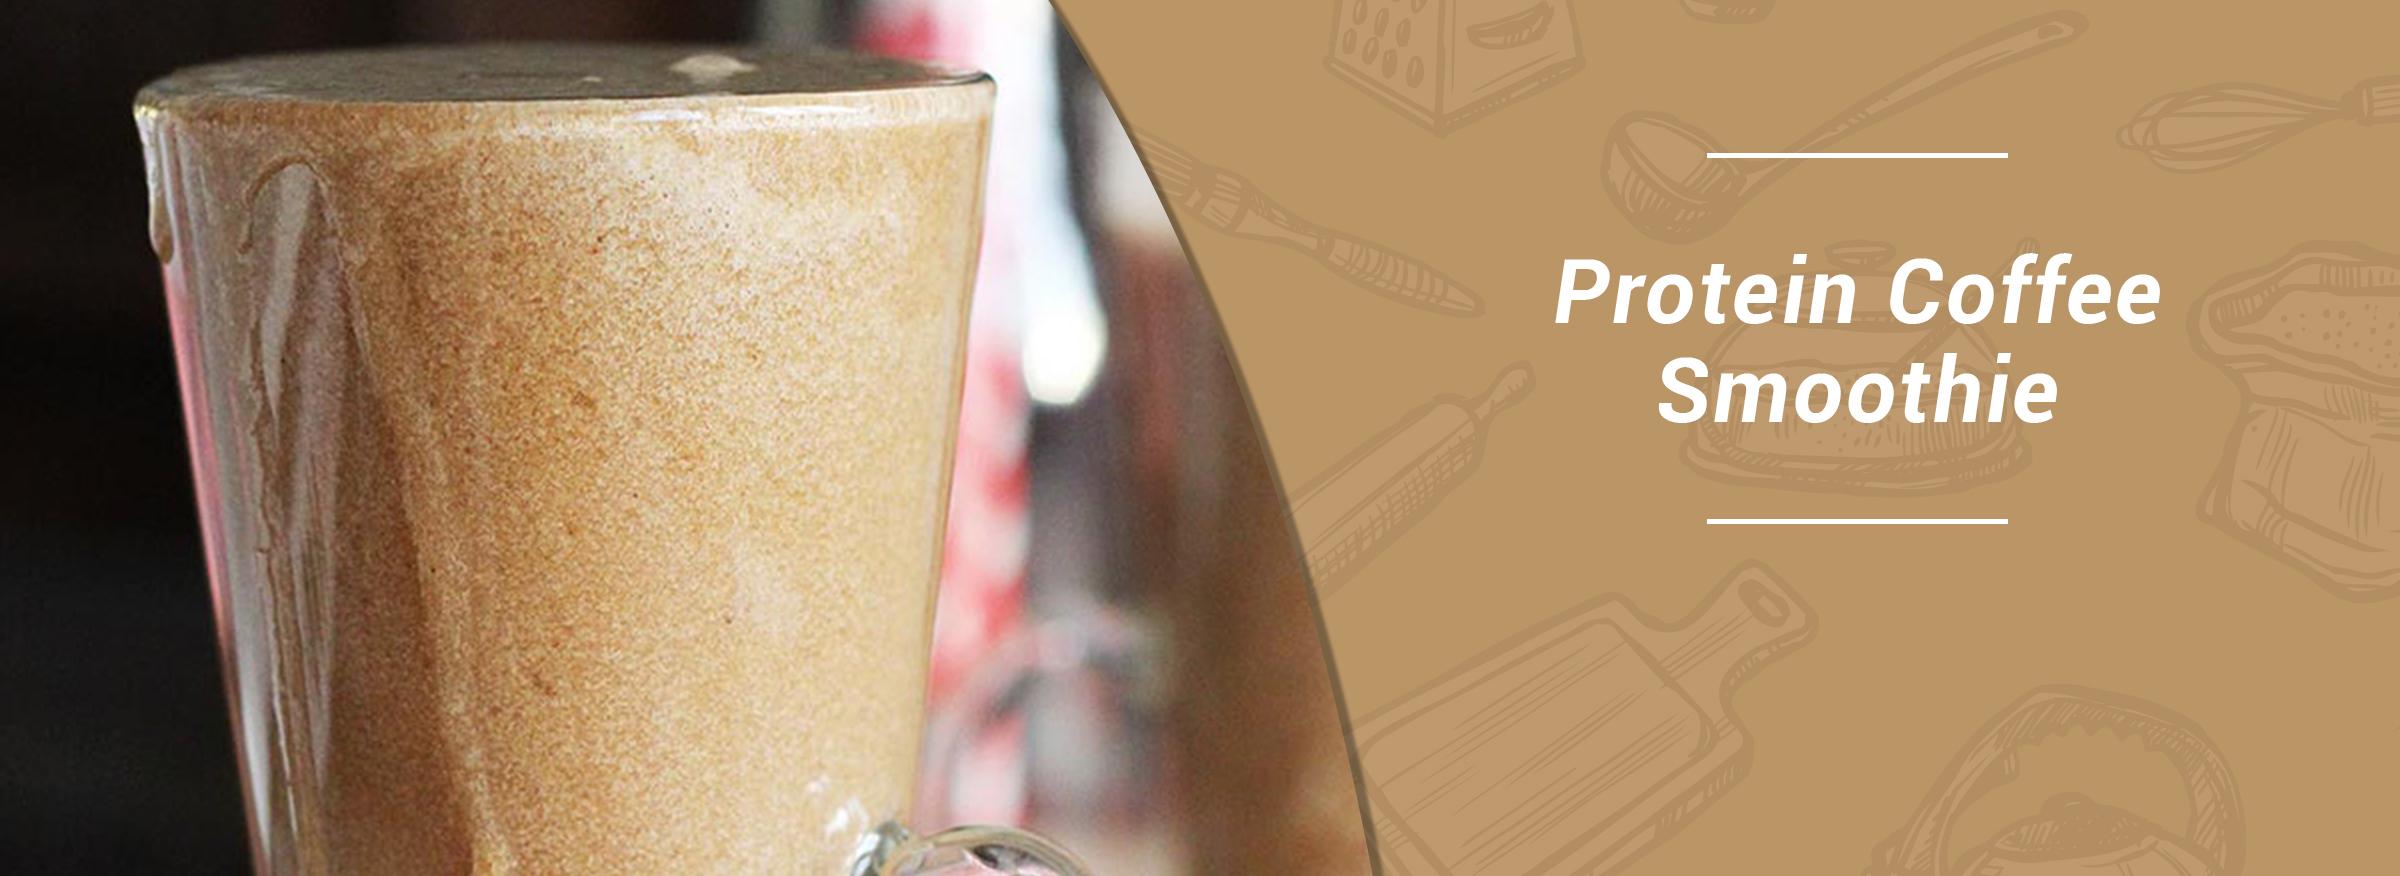 Protein Coffee Smoothie